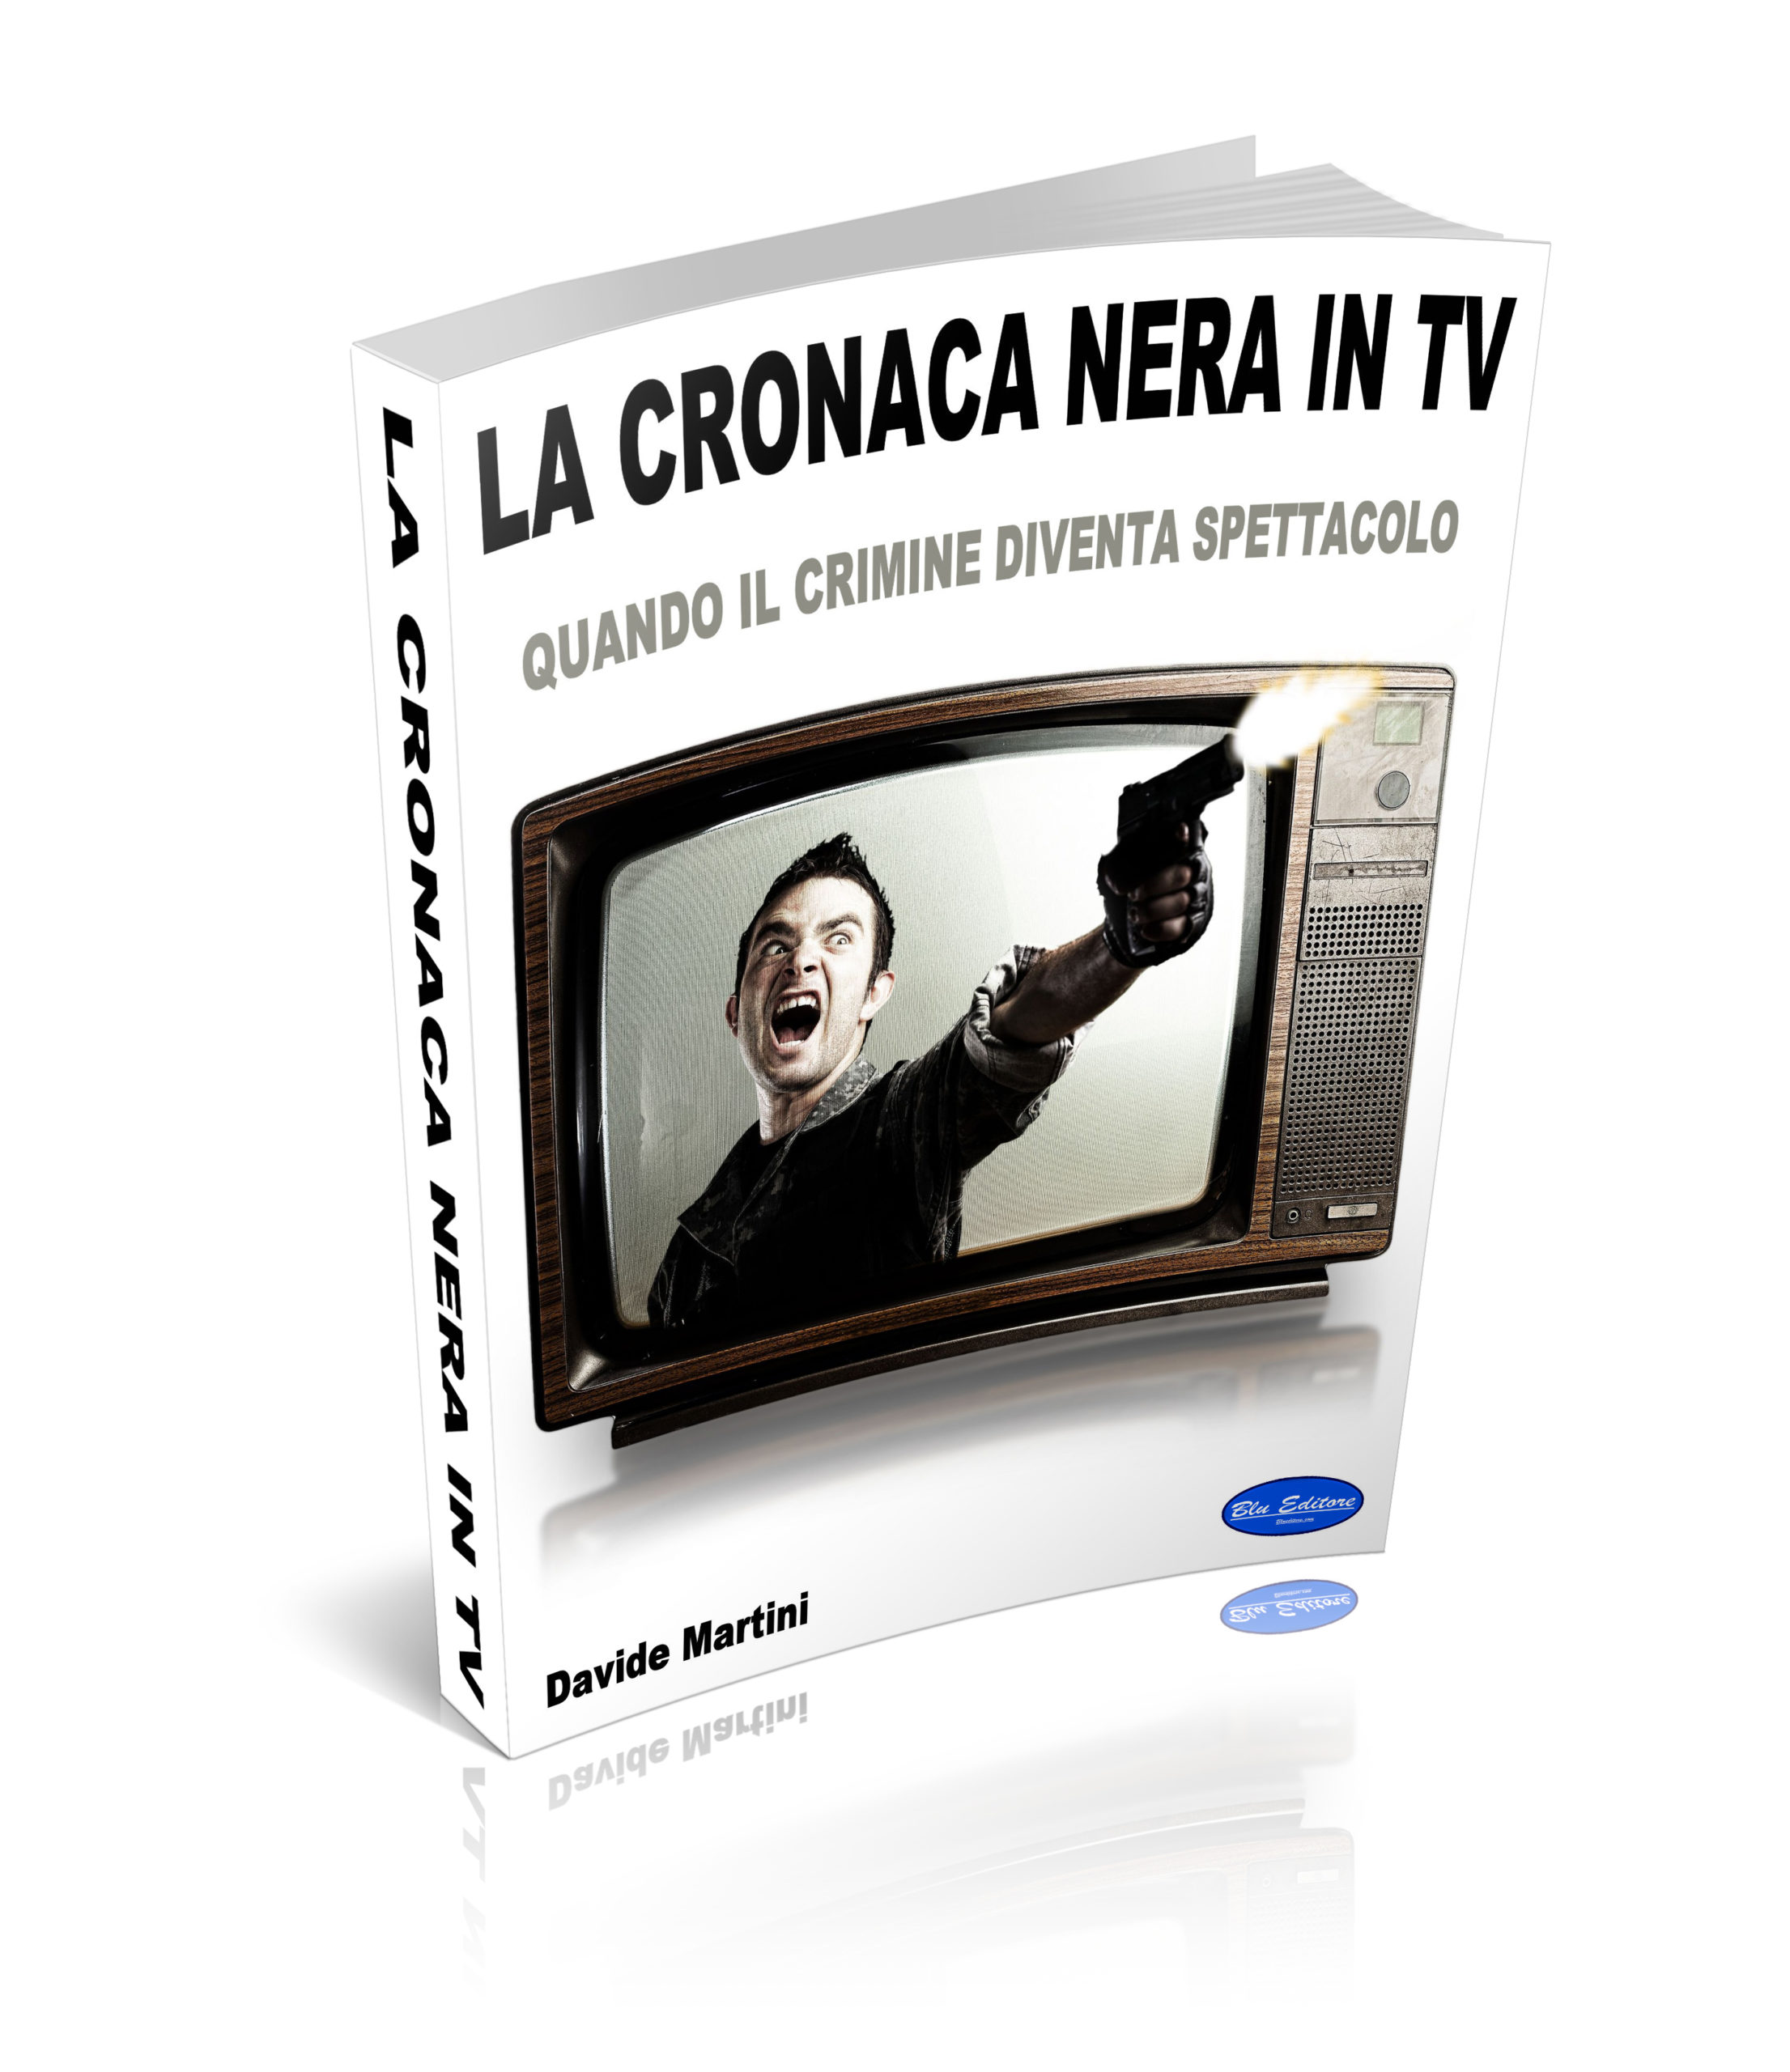 La Cronaca Nera in TV